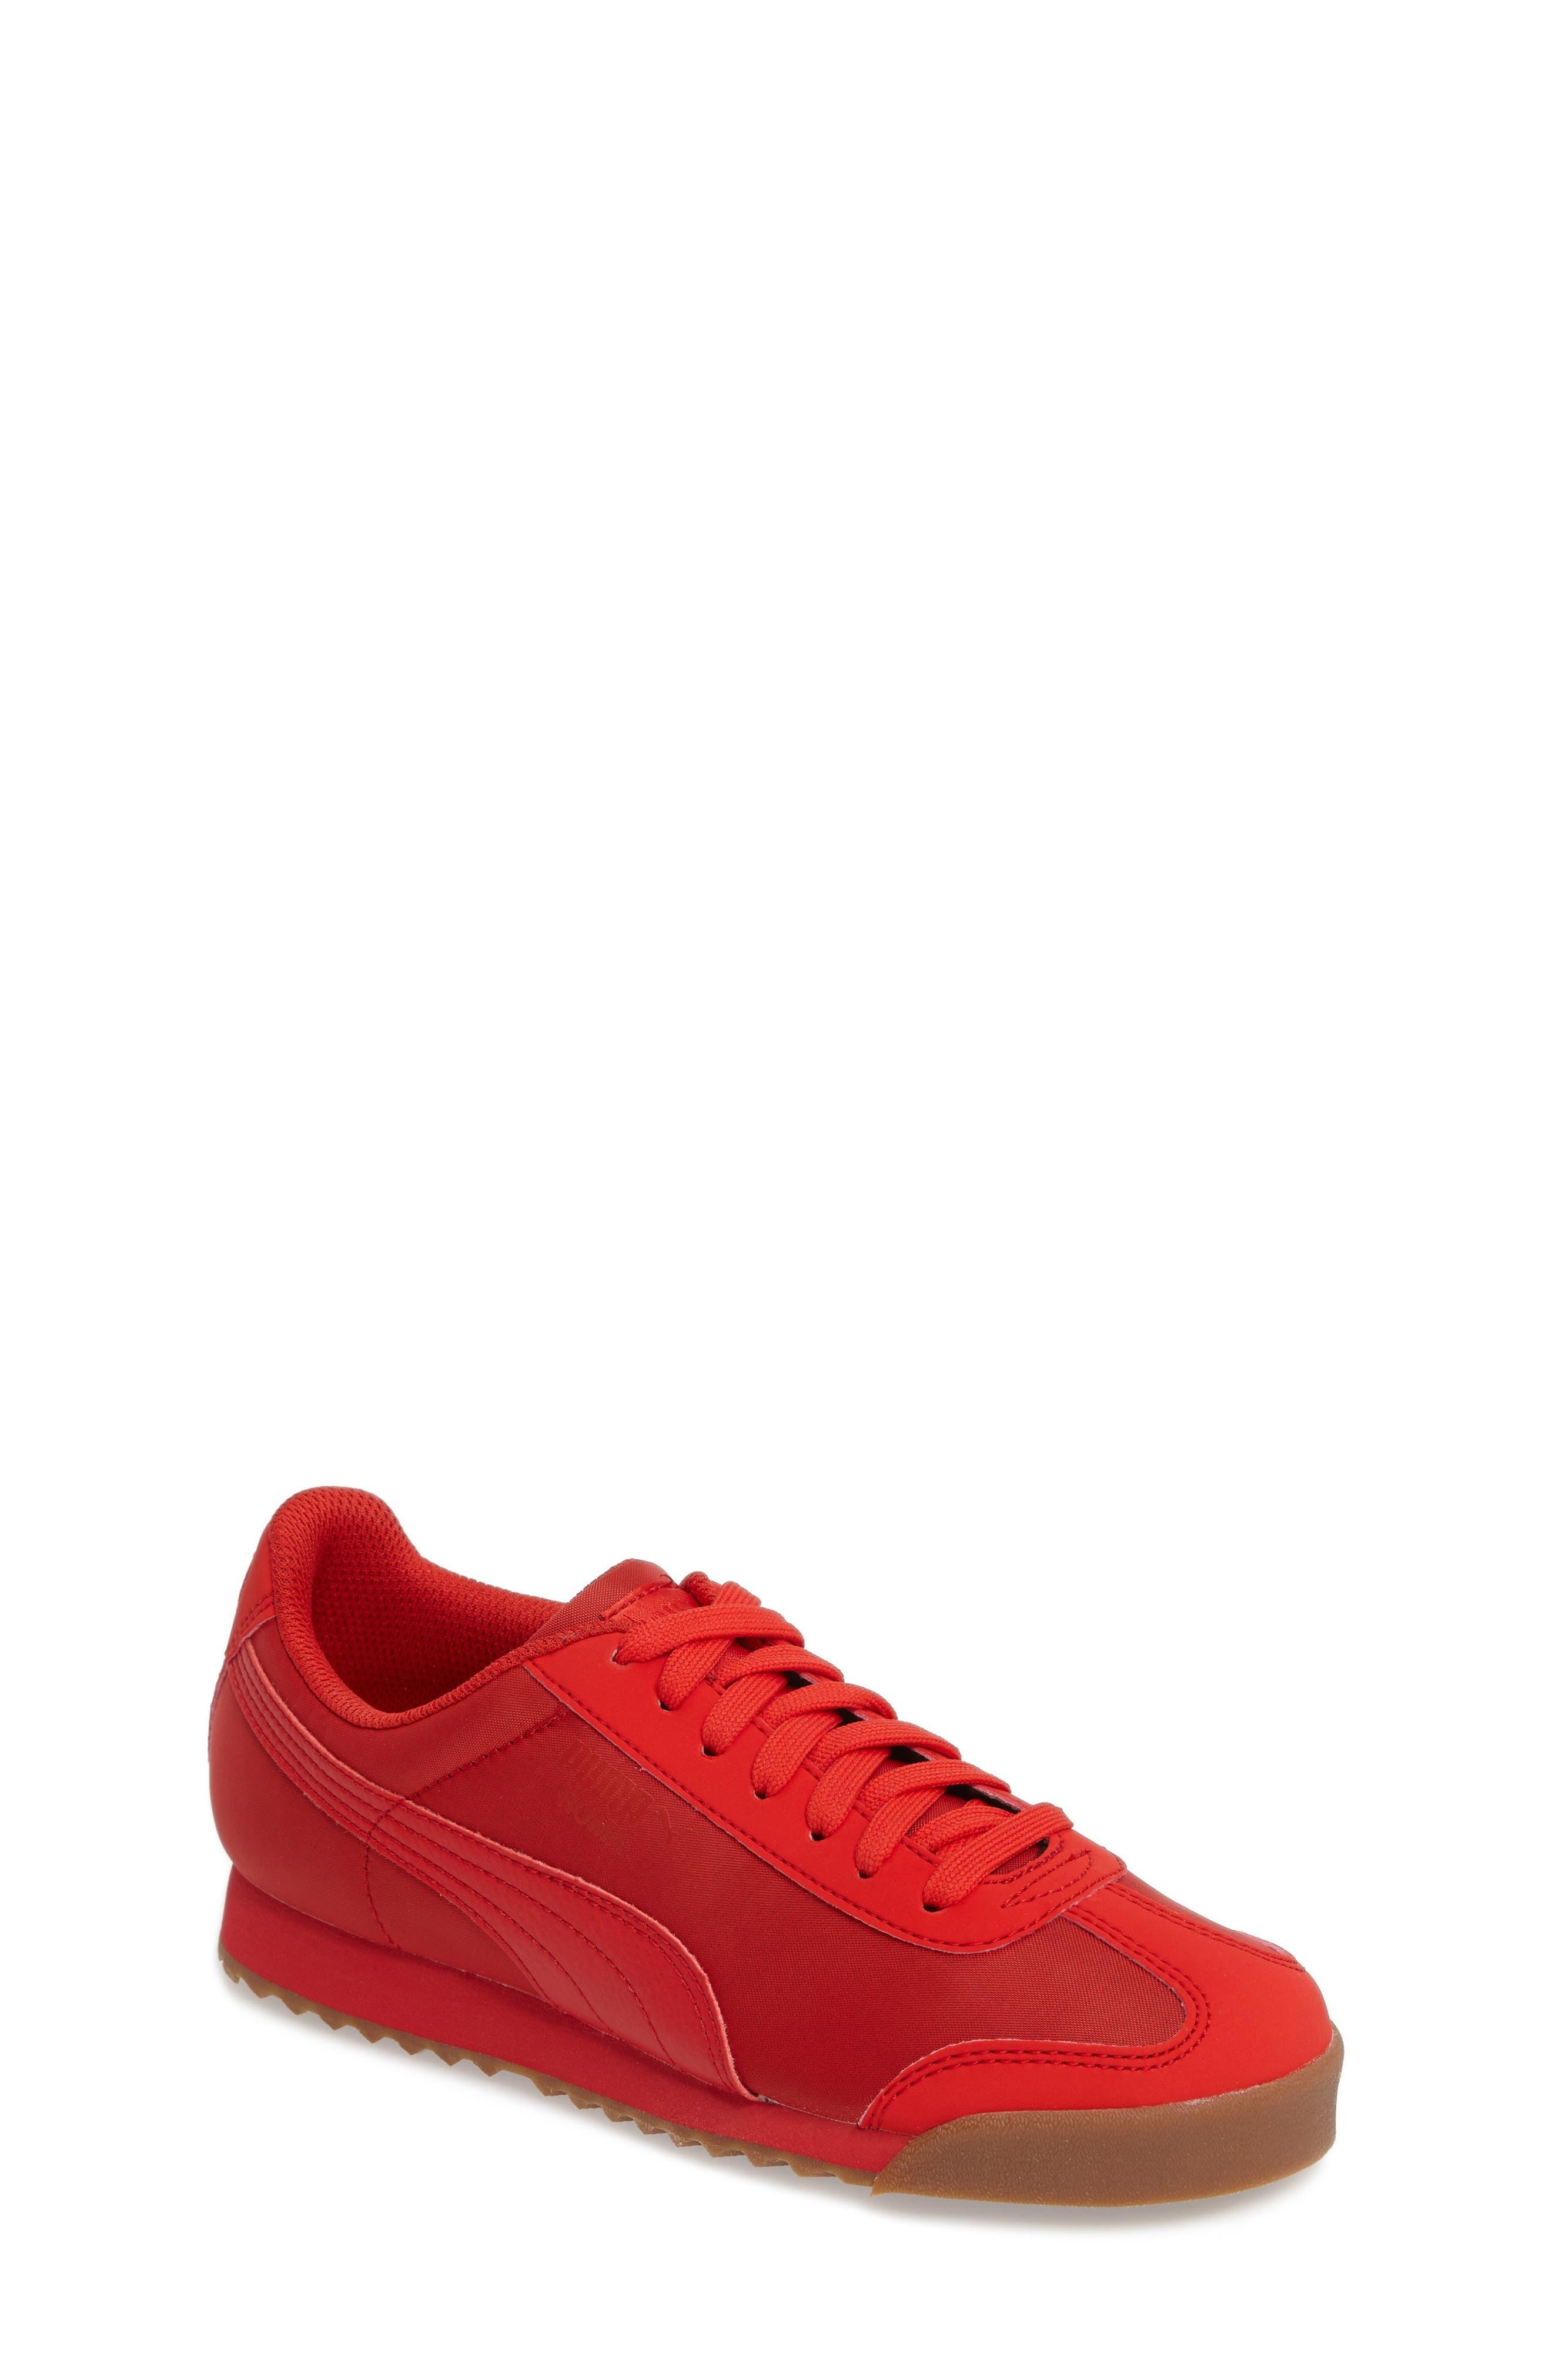 Roma Basic Summer Sneaker,                         Main,                         color, High Risk Red